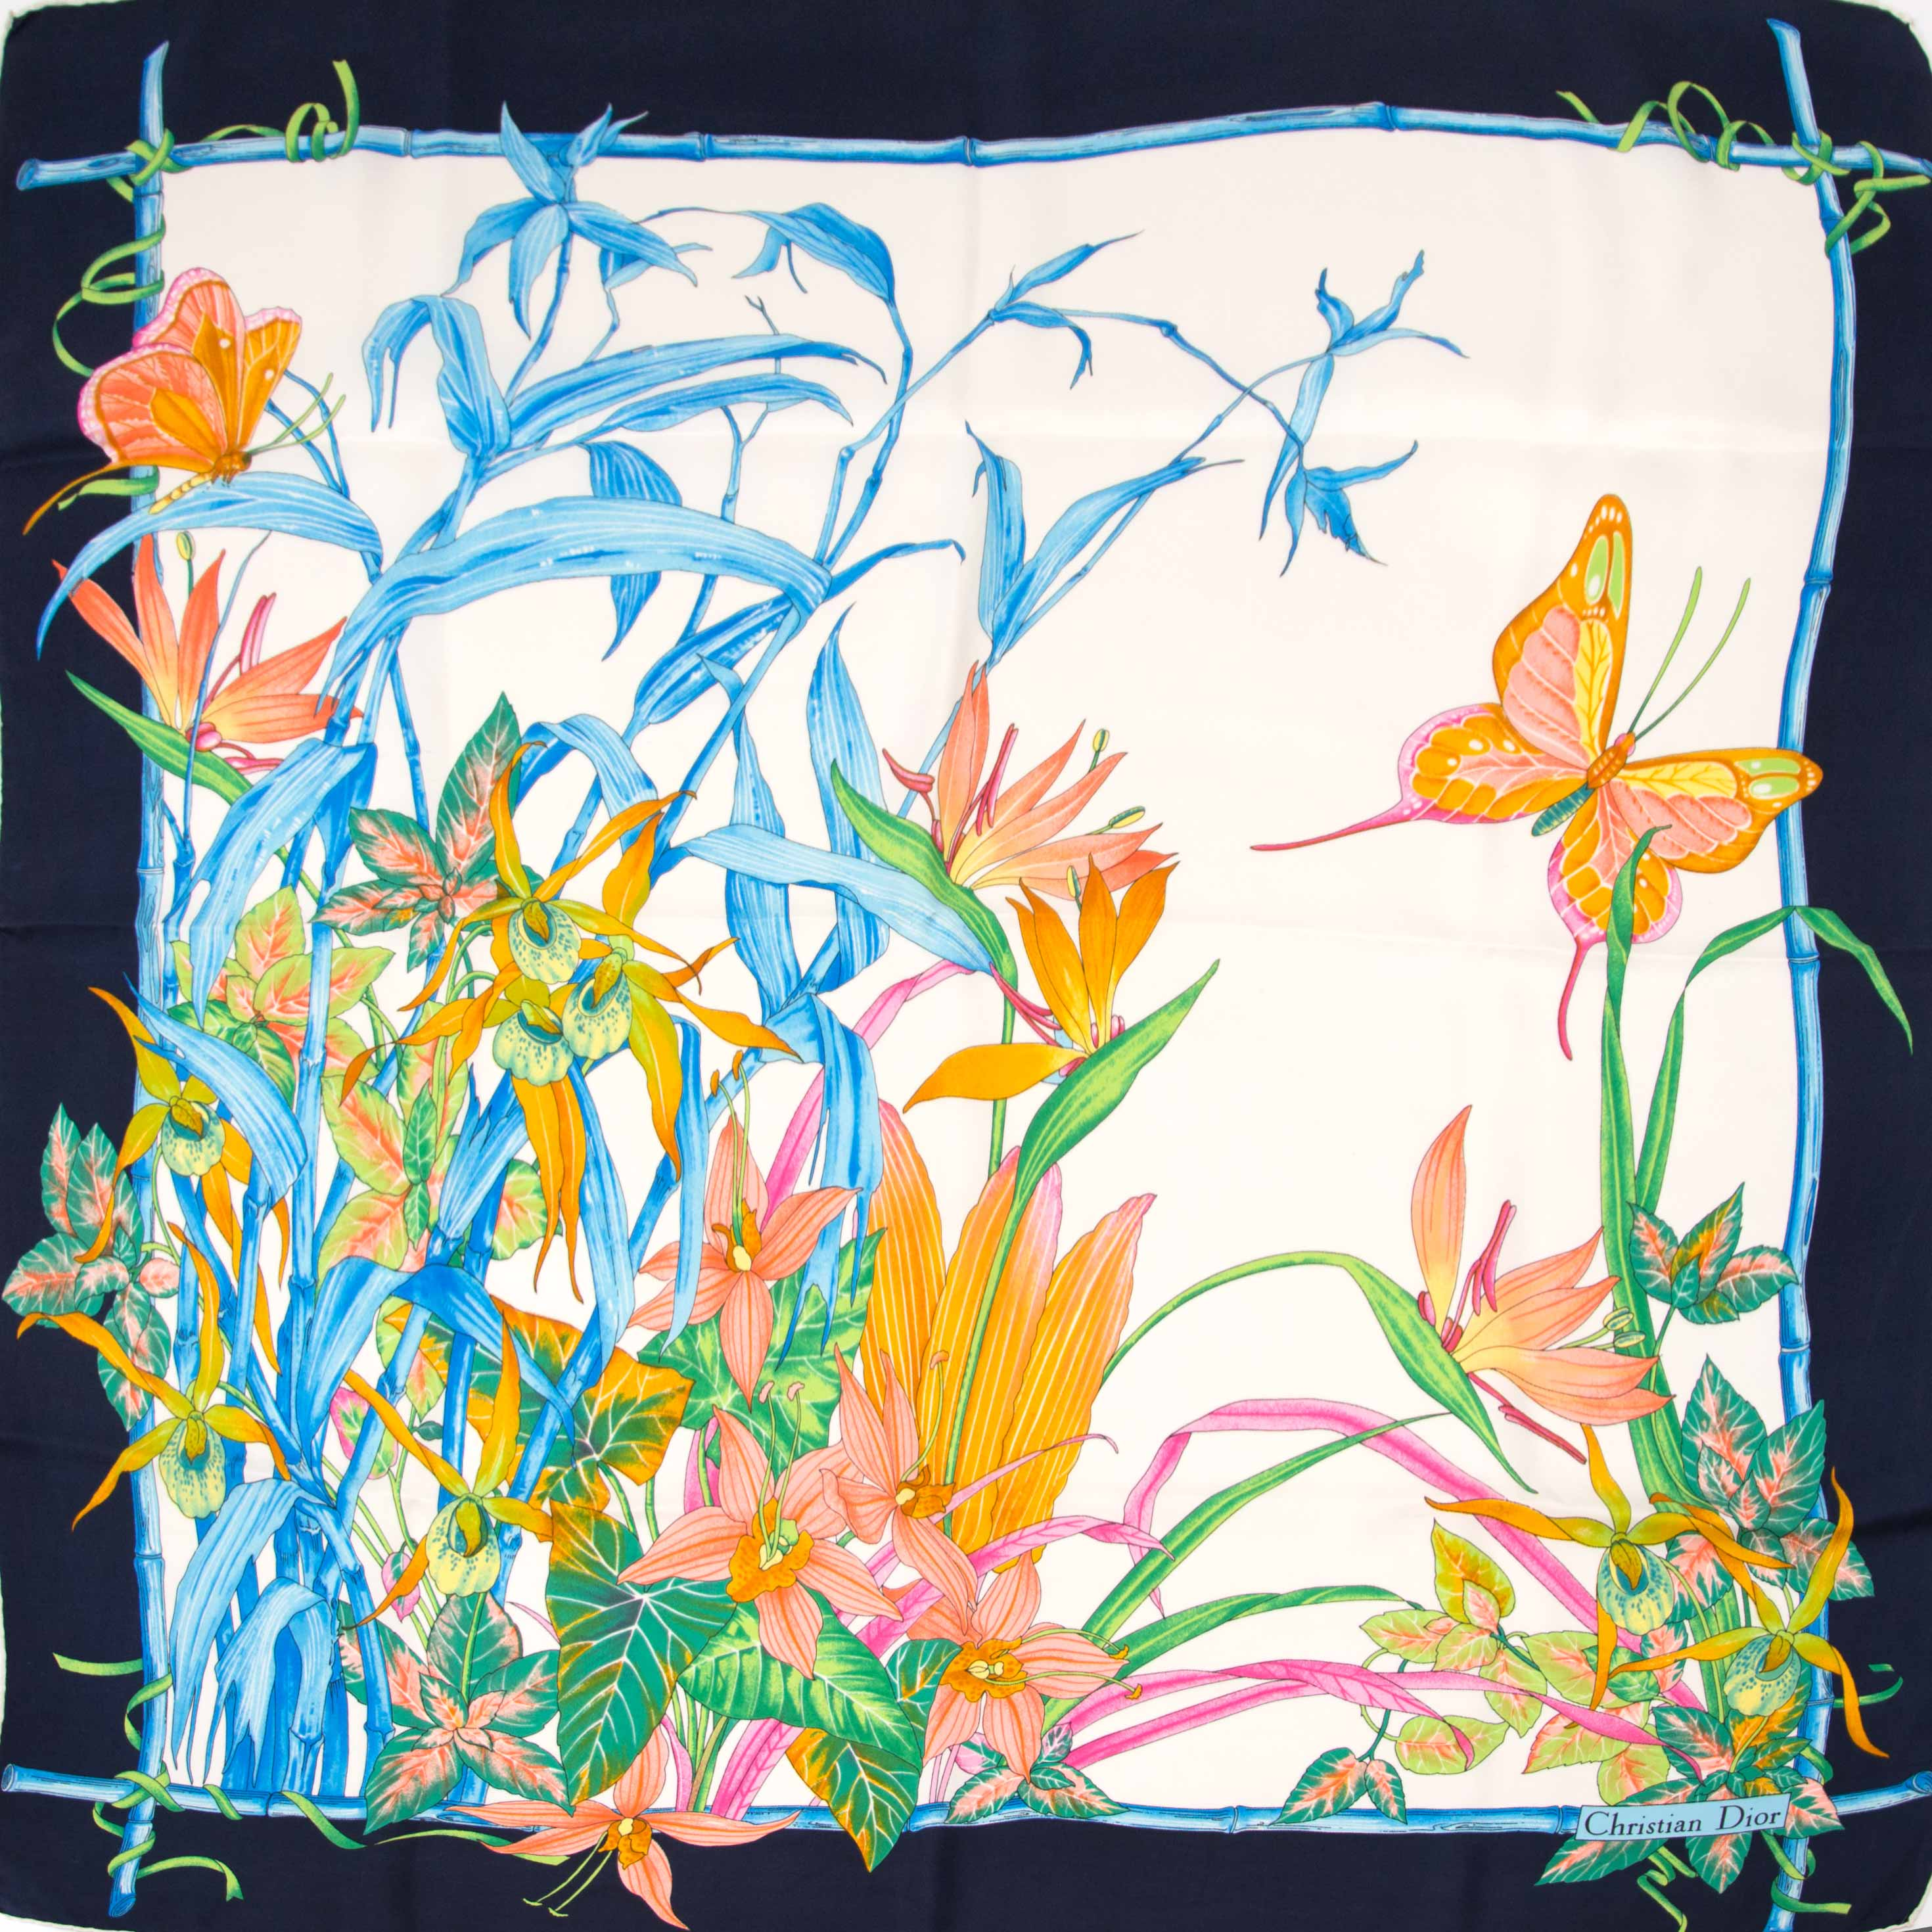 koop nu jouw tweedehands Christian Dior Dark Blue Flowers Scarf op labellov.com